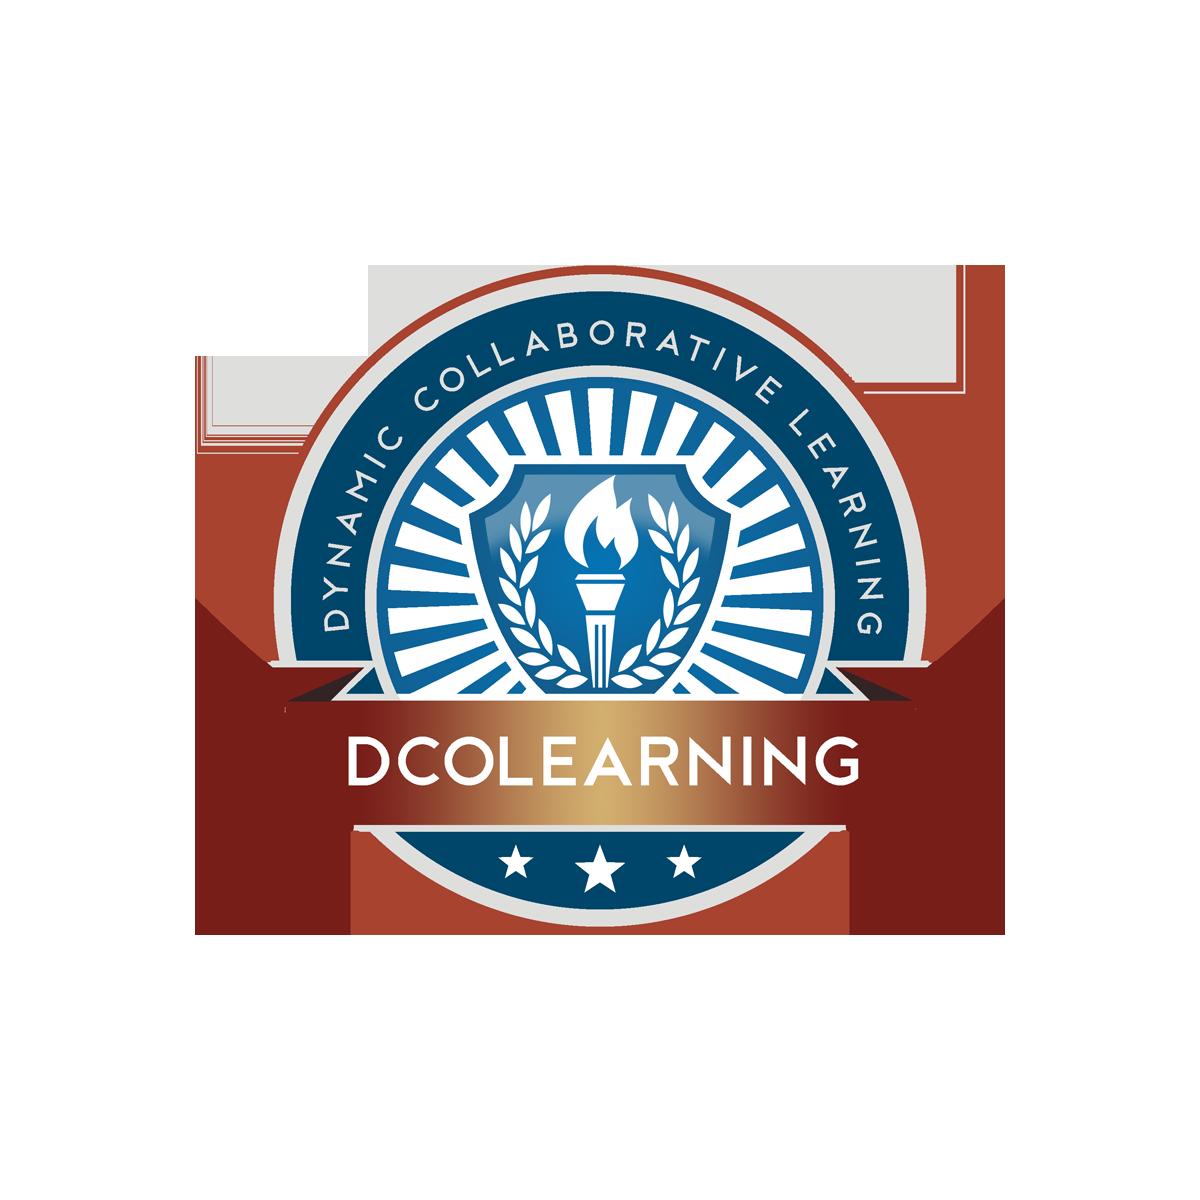 Dcolearning - Accoladia Group